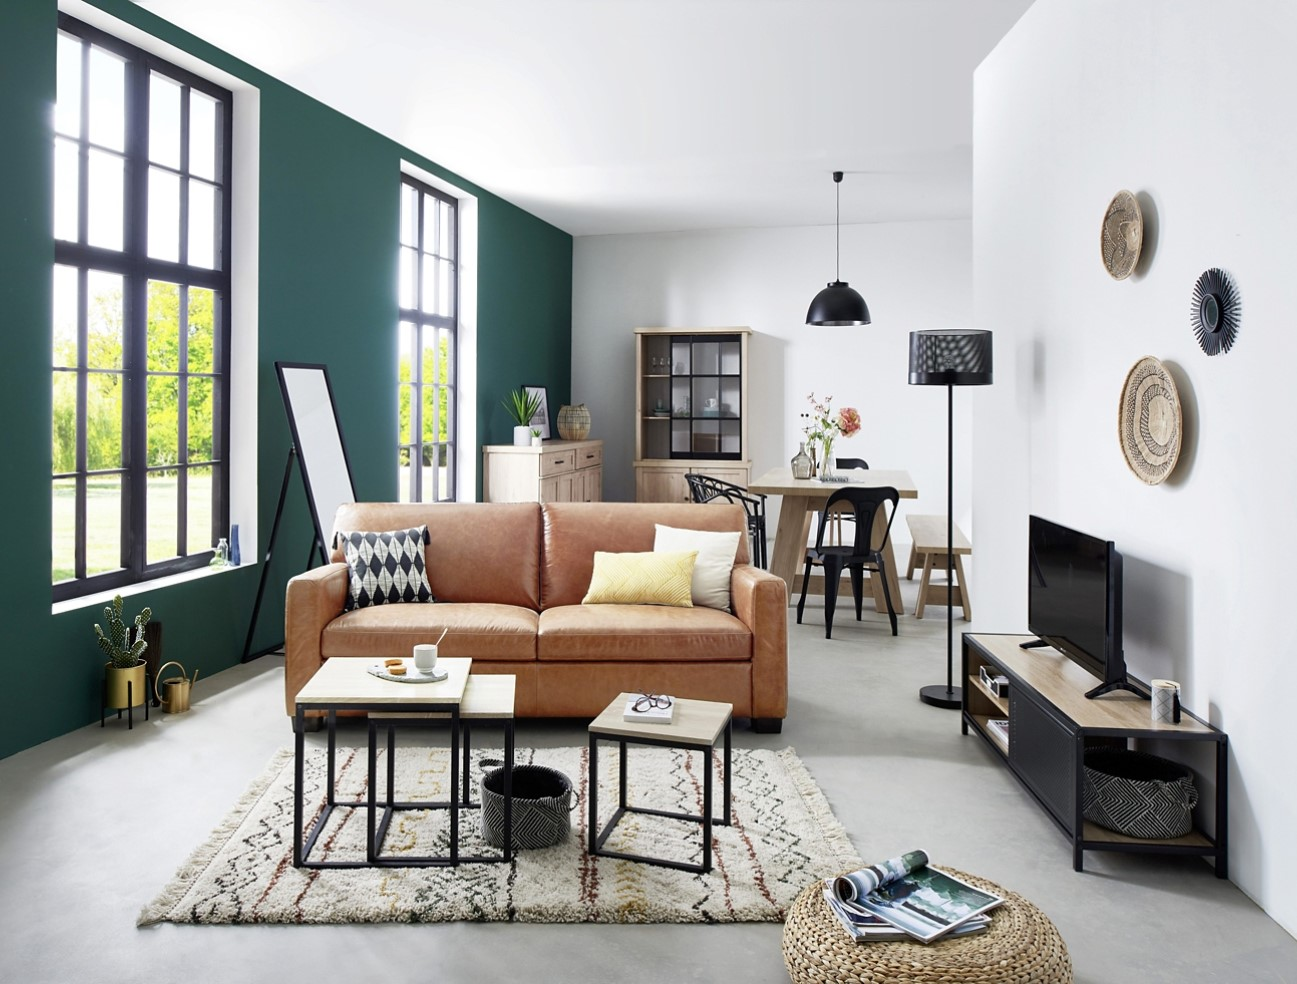 canap brooklyn 2 places alin a en cuir vachette marron. Black Bedroom Furniture Sets. Home Design Ideas